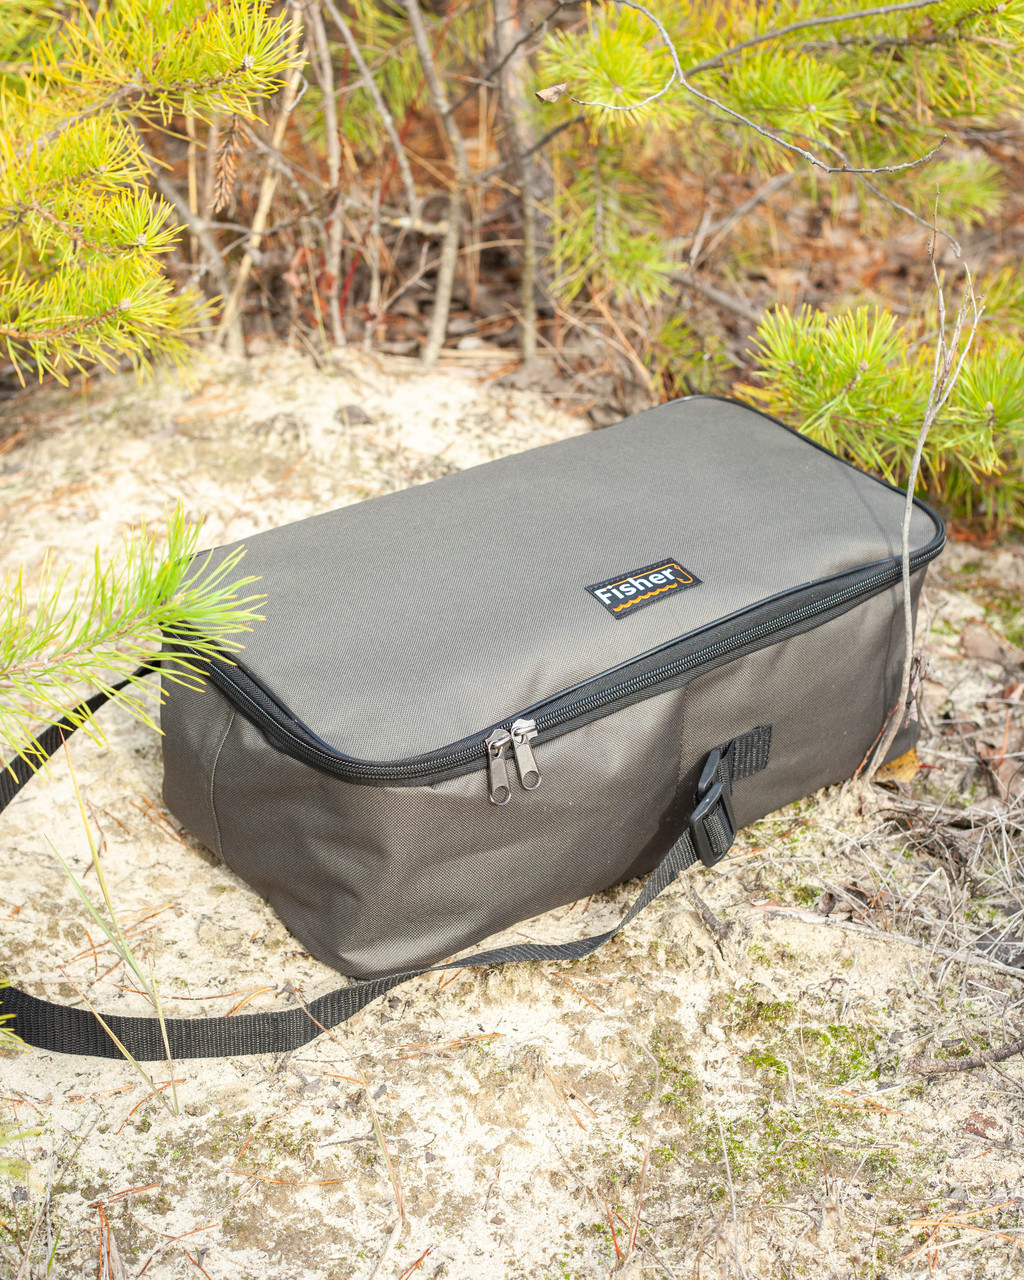 Сумка для жерлиц, Транспортувальна сумка для жерлиц, Fisher 10шт